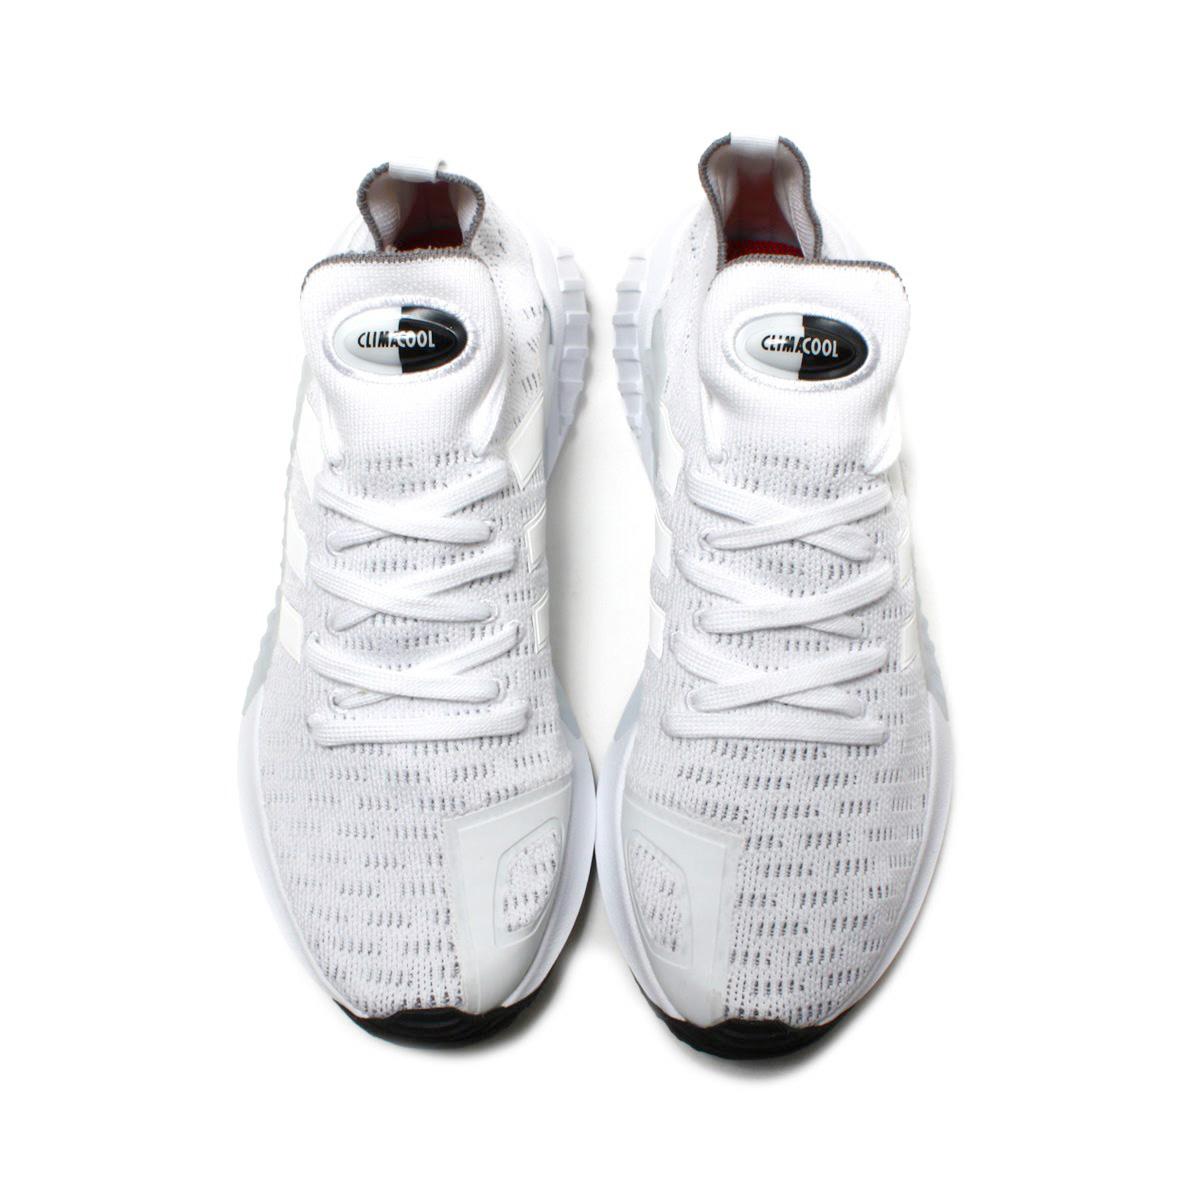 quality design 89aee a8a35 adidas Originals CLIMACOOL 0217 PK (アディダスオリジナルスクライマクール 0217 PK) Running  WhiteRunning WhiteGrey 18SS-I